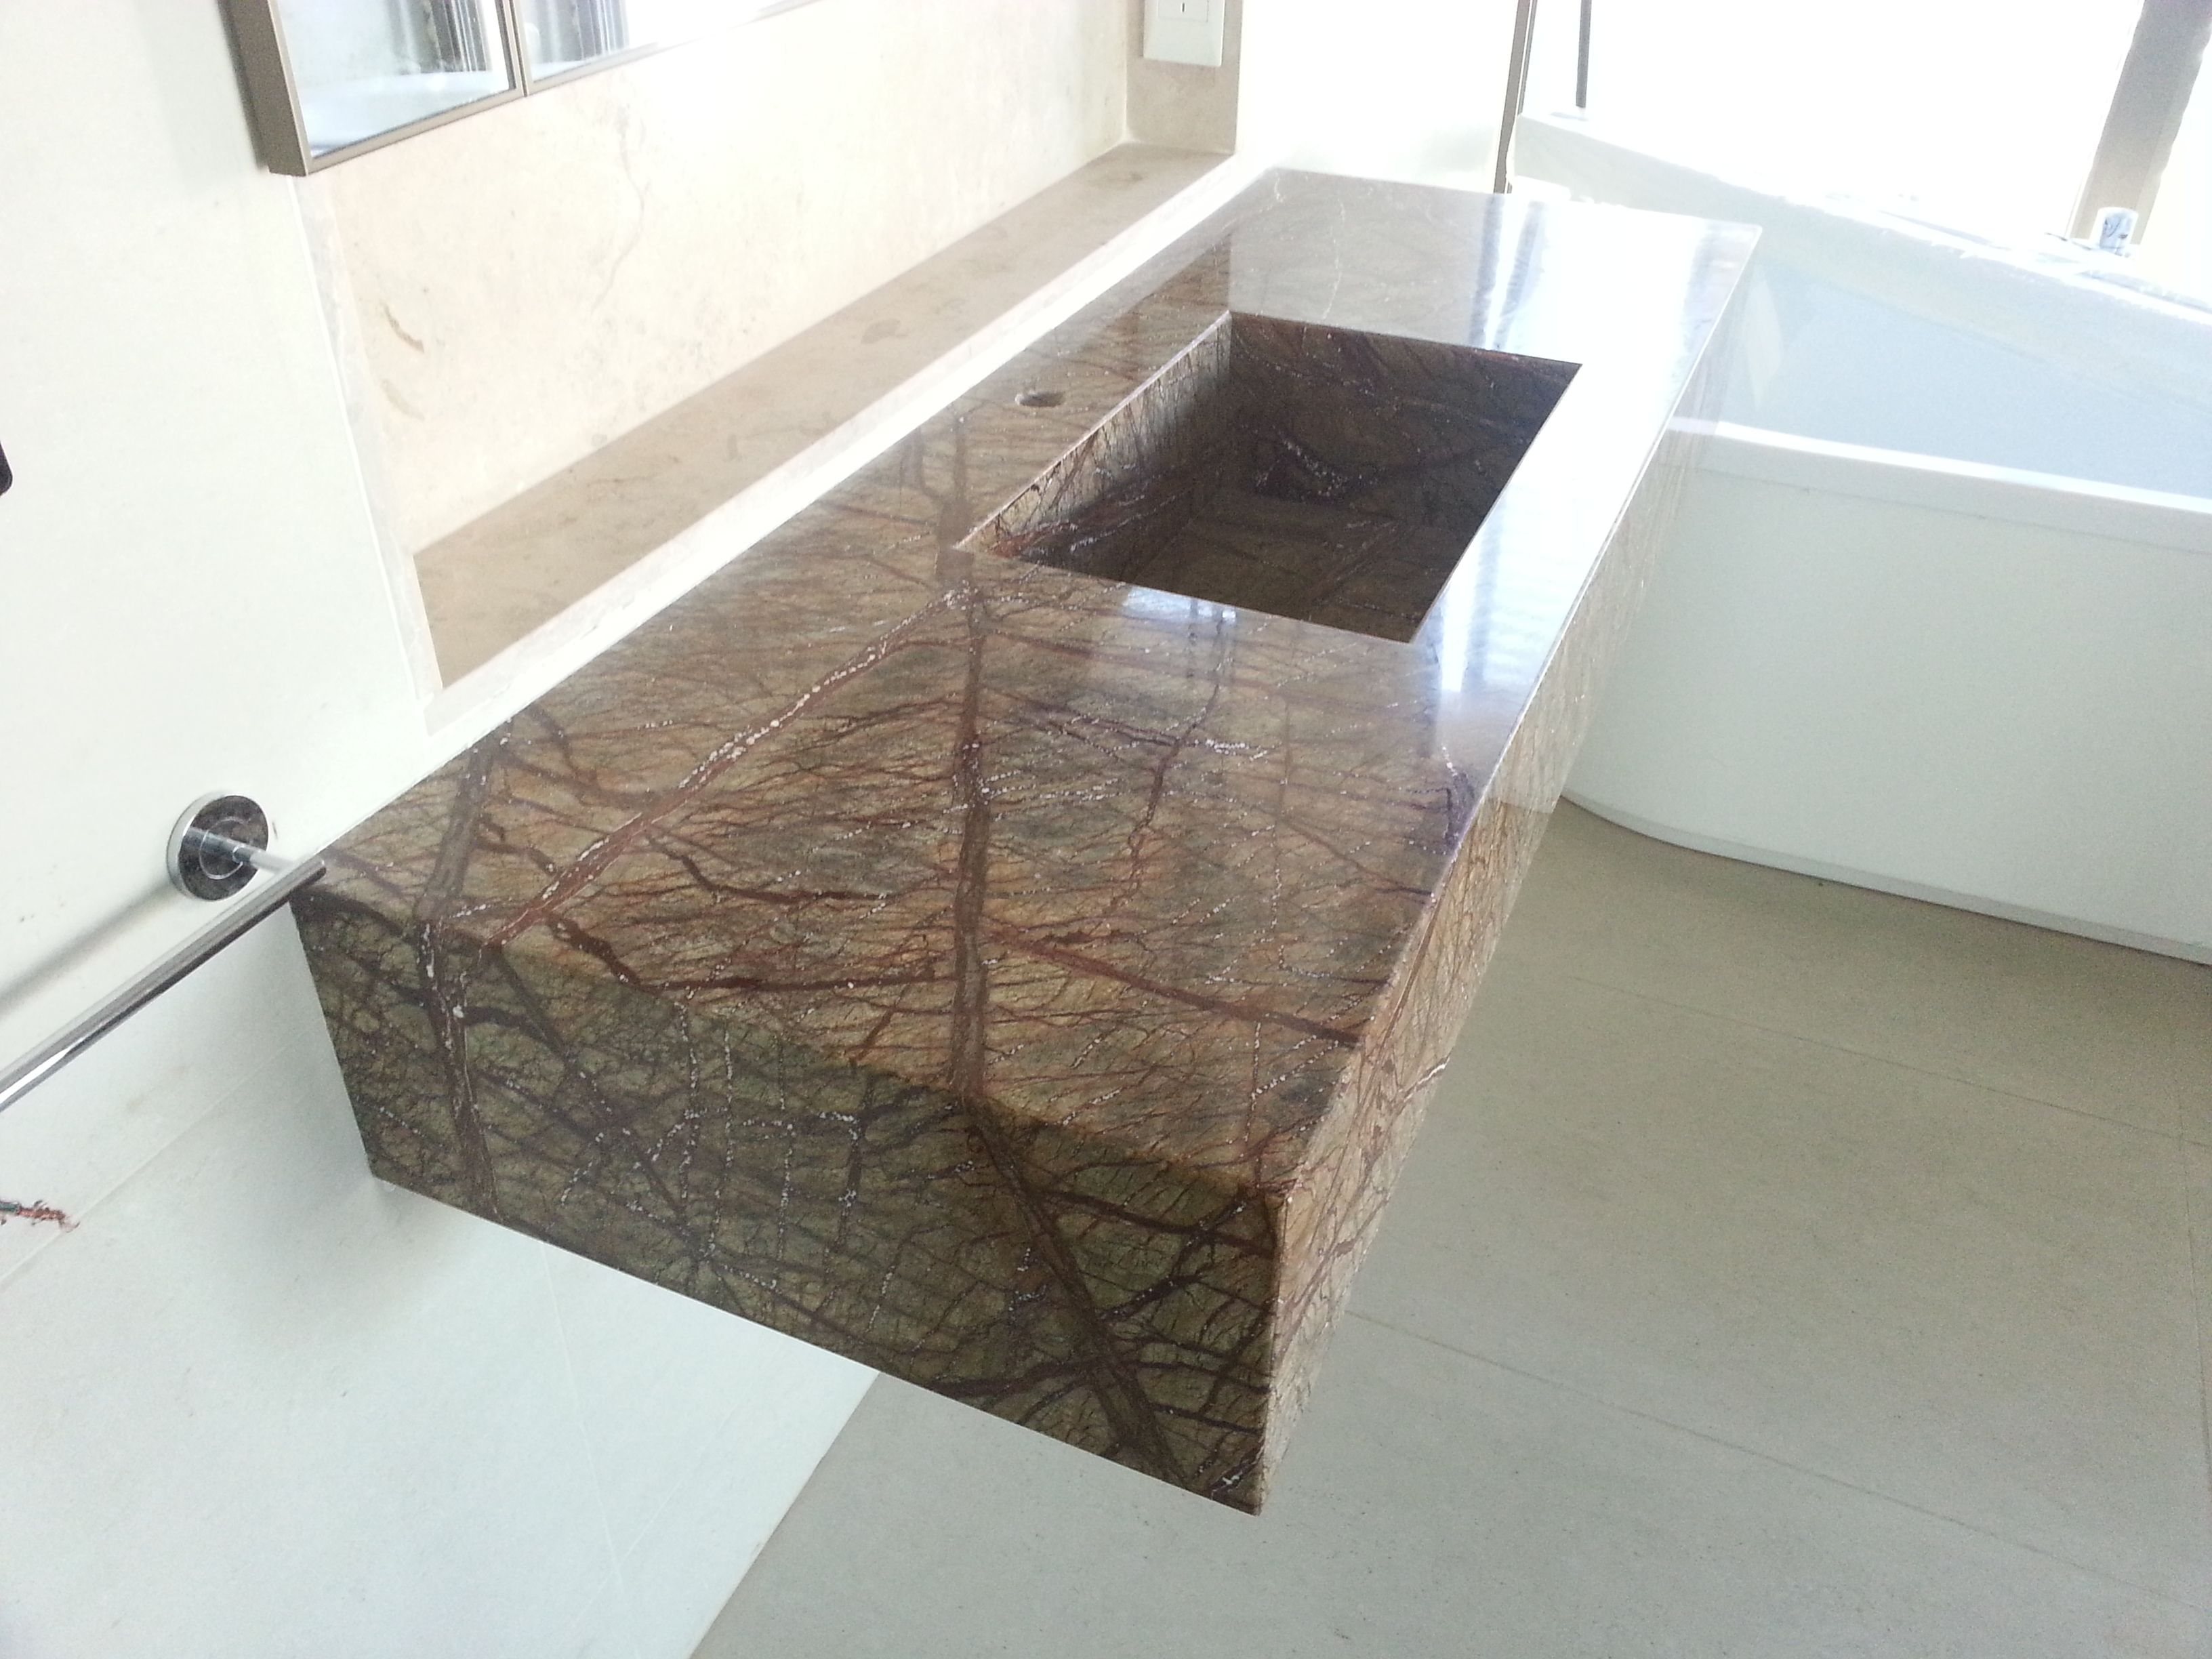 Placas de marmol sintetico buscar con google ba os - Banos con marmol ...